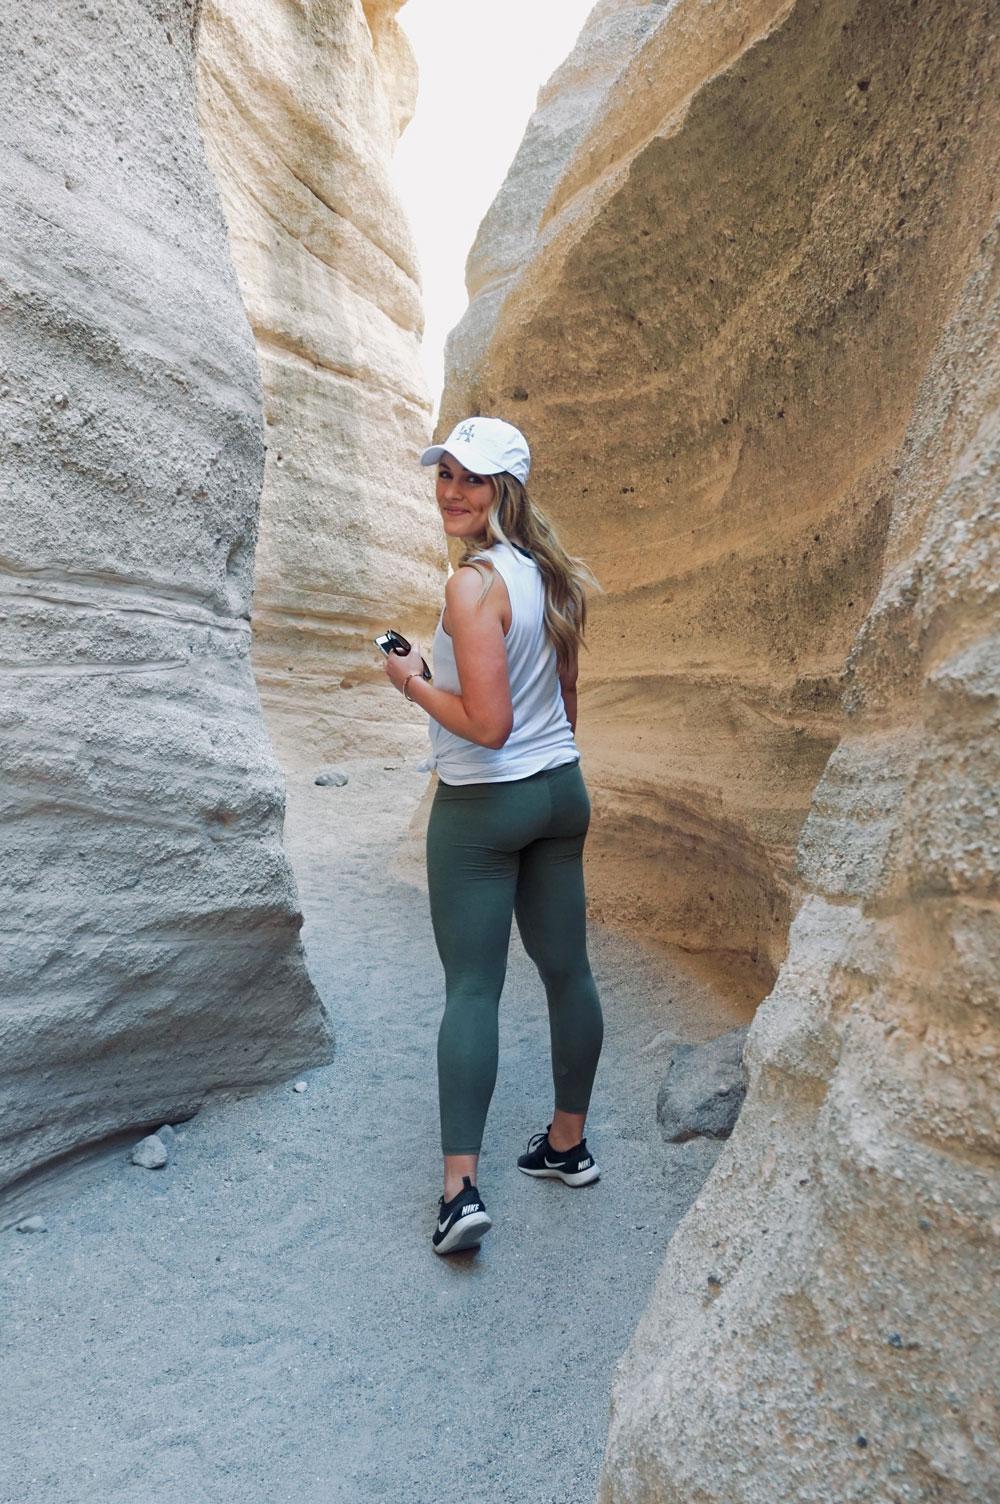 hiking at tent rocks